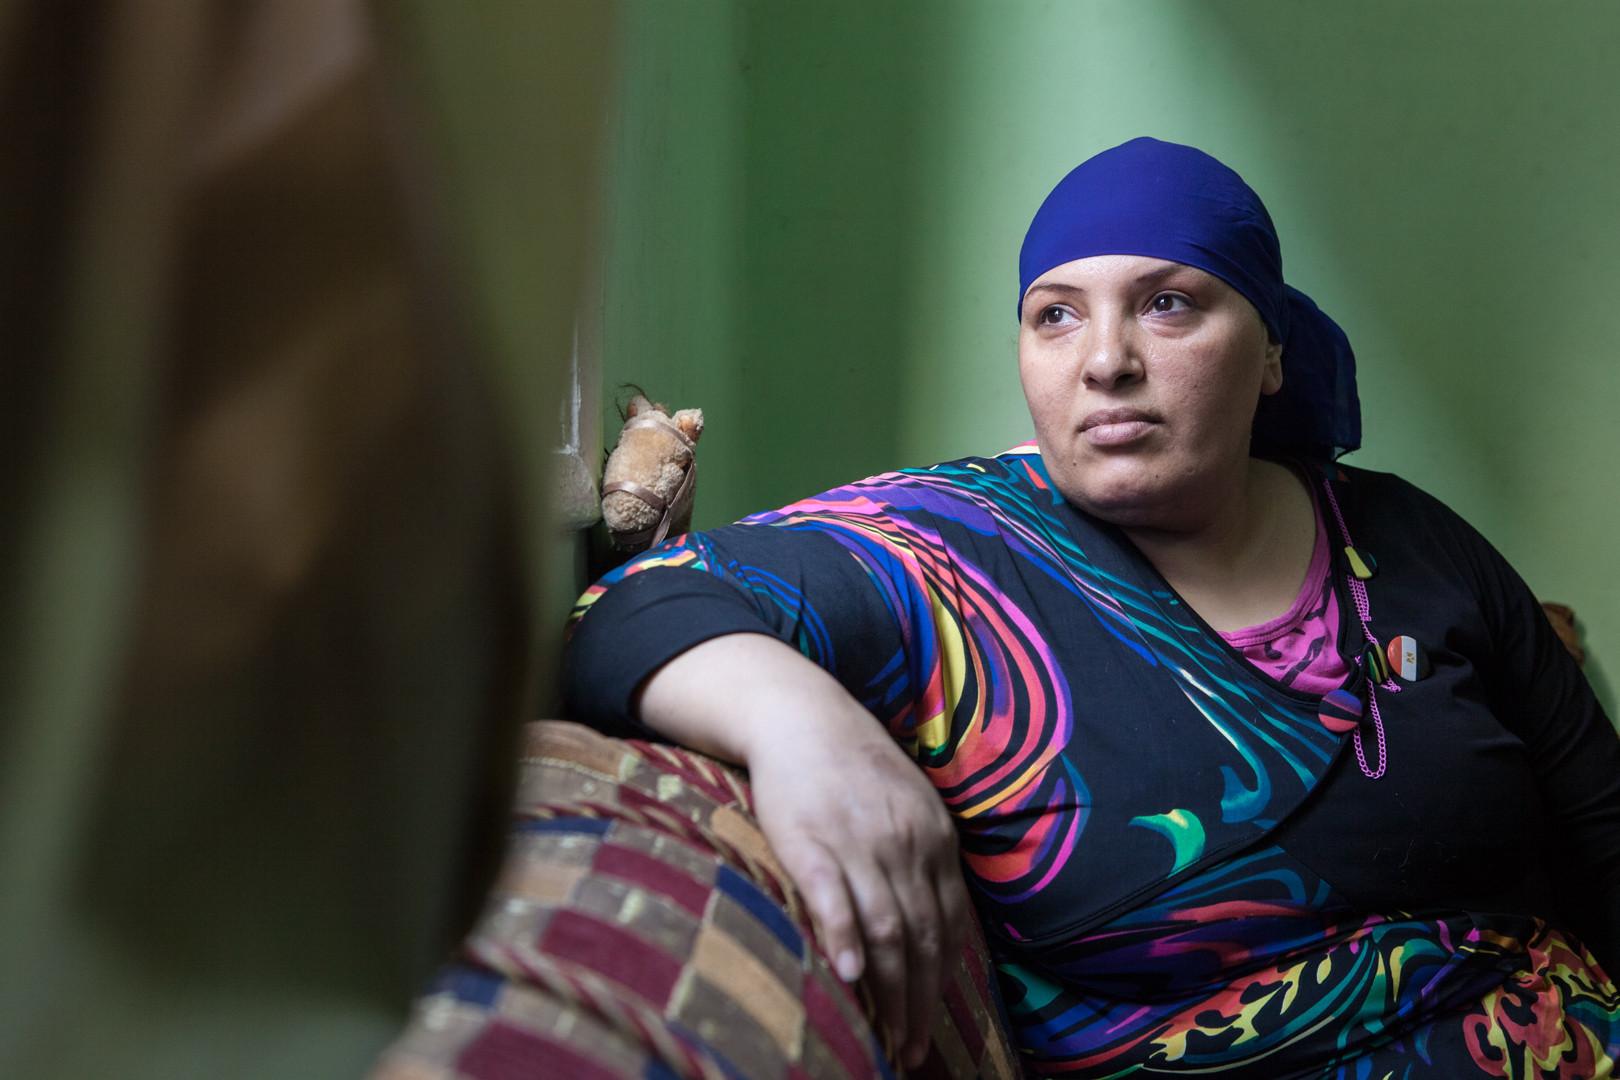 Amélie Losier.  Mona Farrag Abdelati, 42 Jahre Kairo, Ägypten, 2014